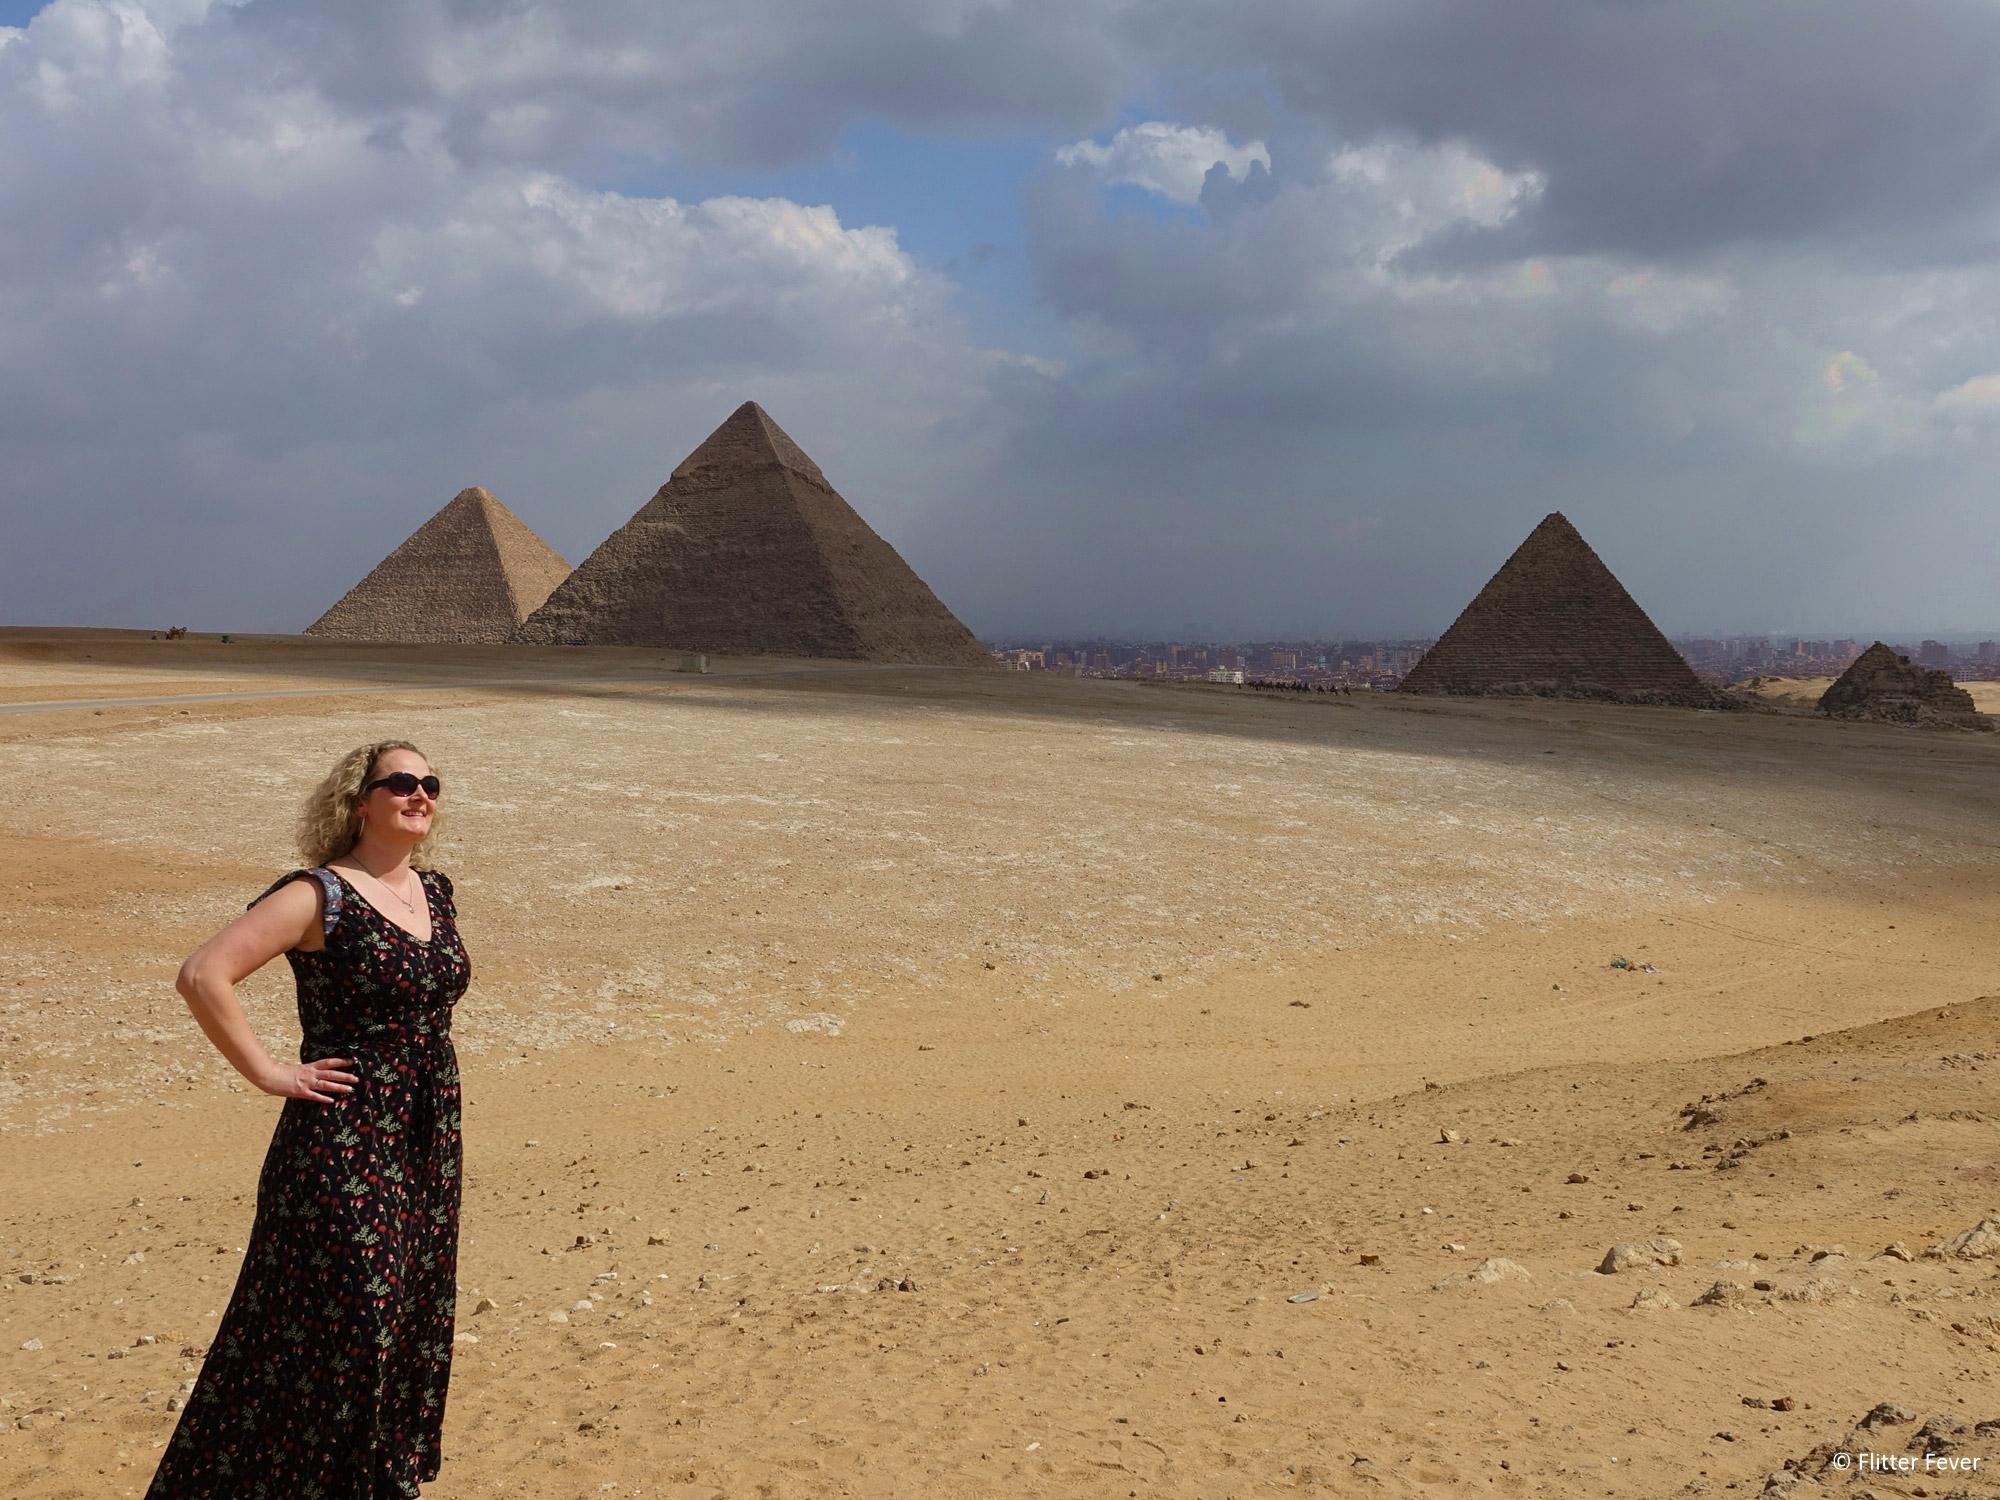 Flitter Fever - Giza piramides van Egypte